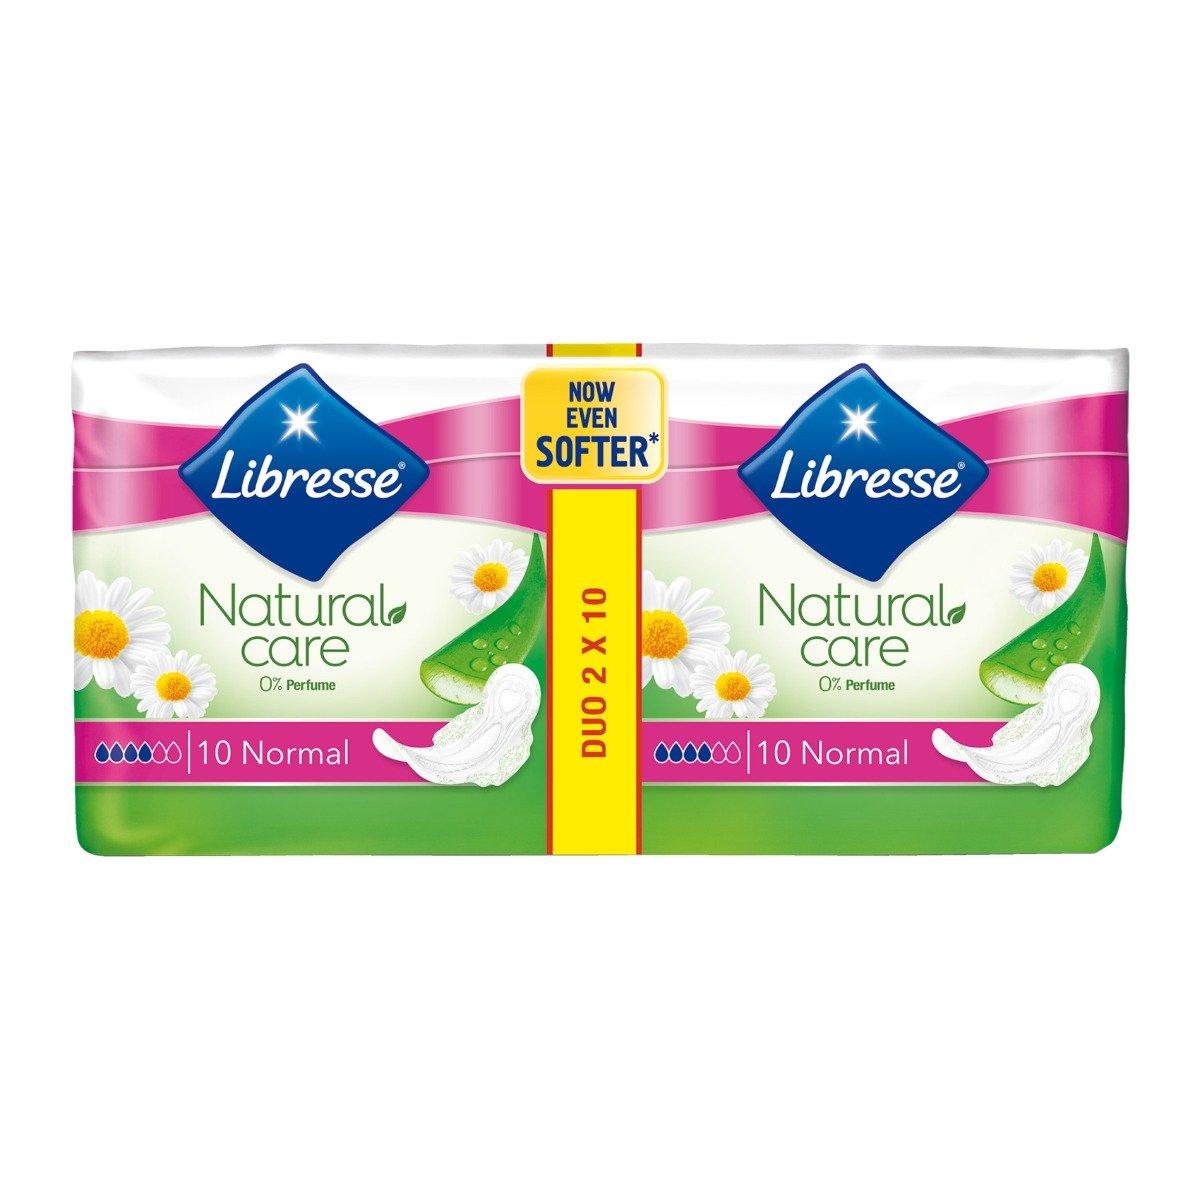 Absorbante Libresse Natural Care Ultra Normal, 20 bucati